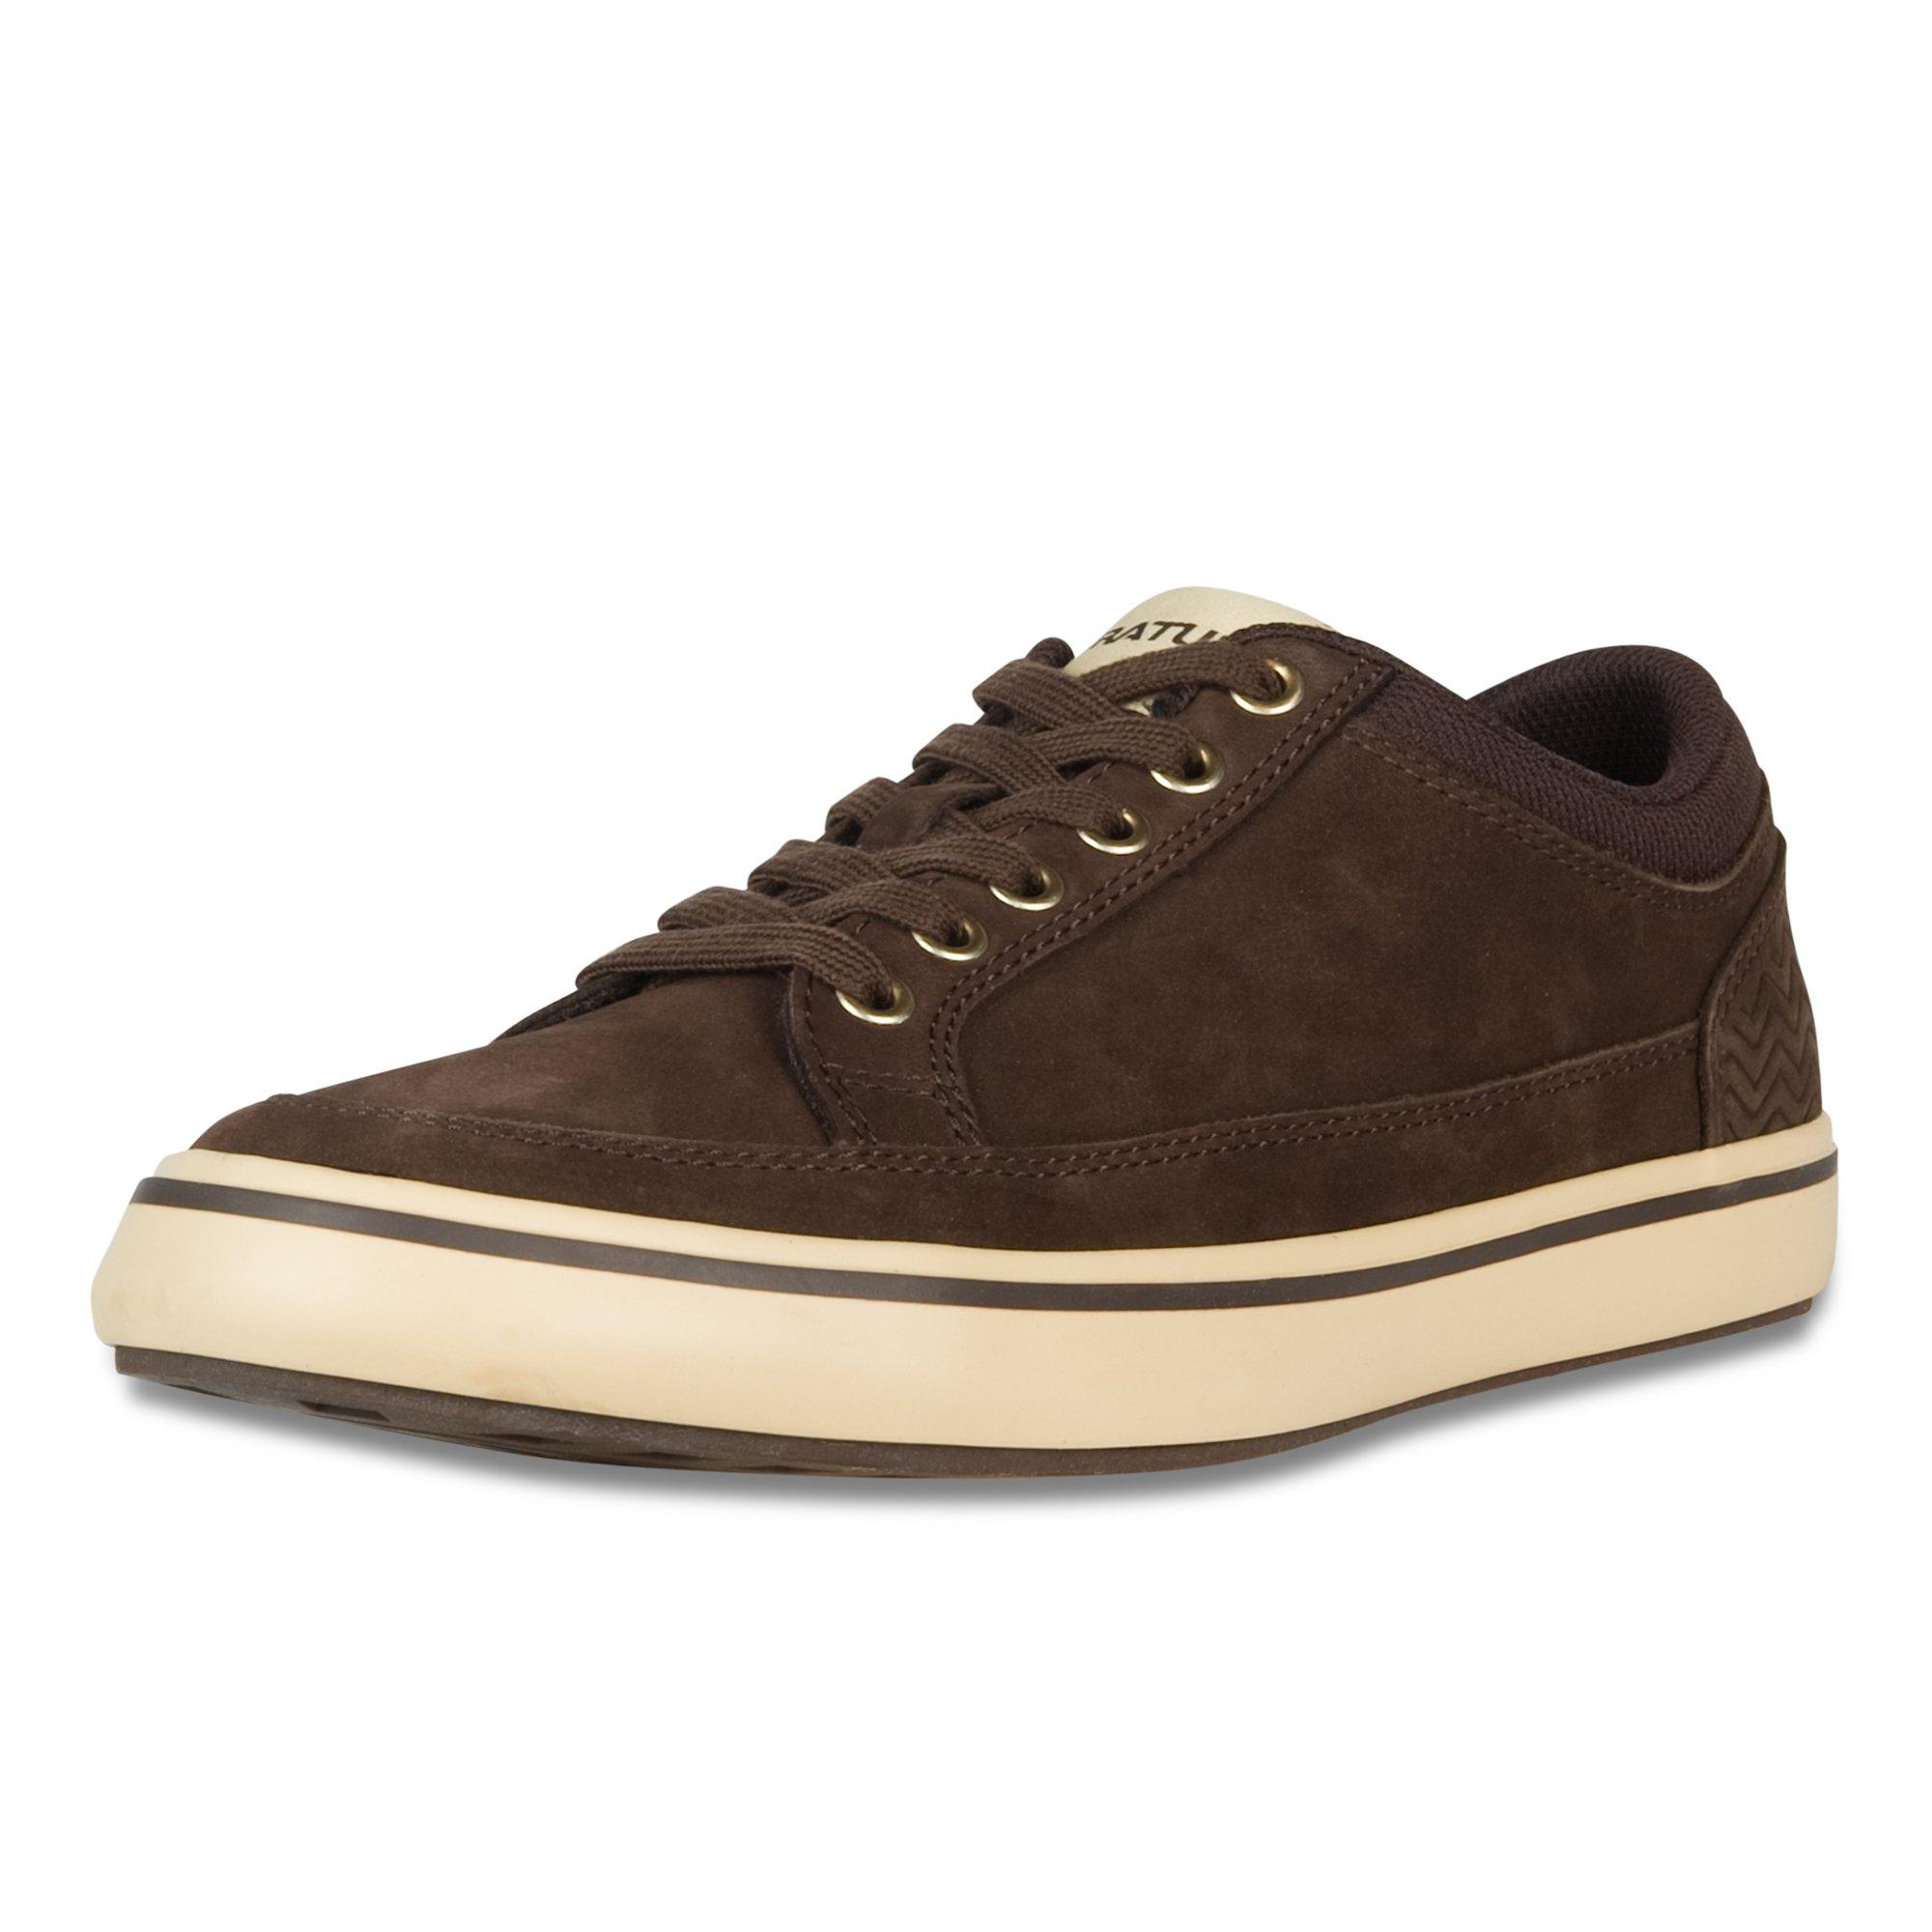 XTRATUF Chumrunner Men's Nubuck Leather Deck Shoes, Chocolate (22401)